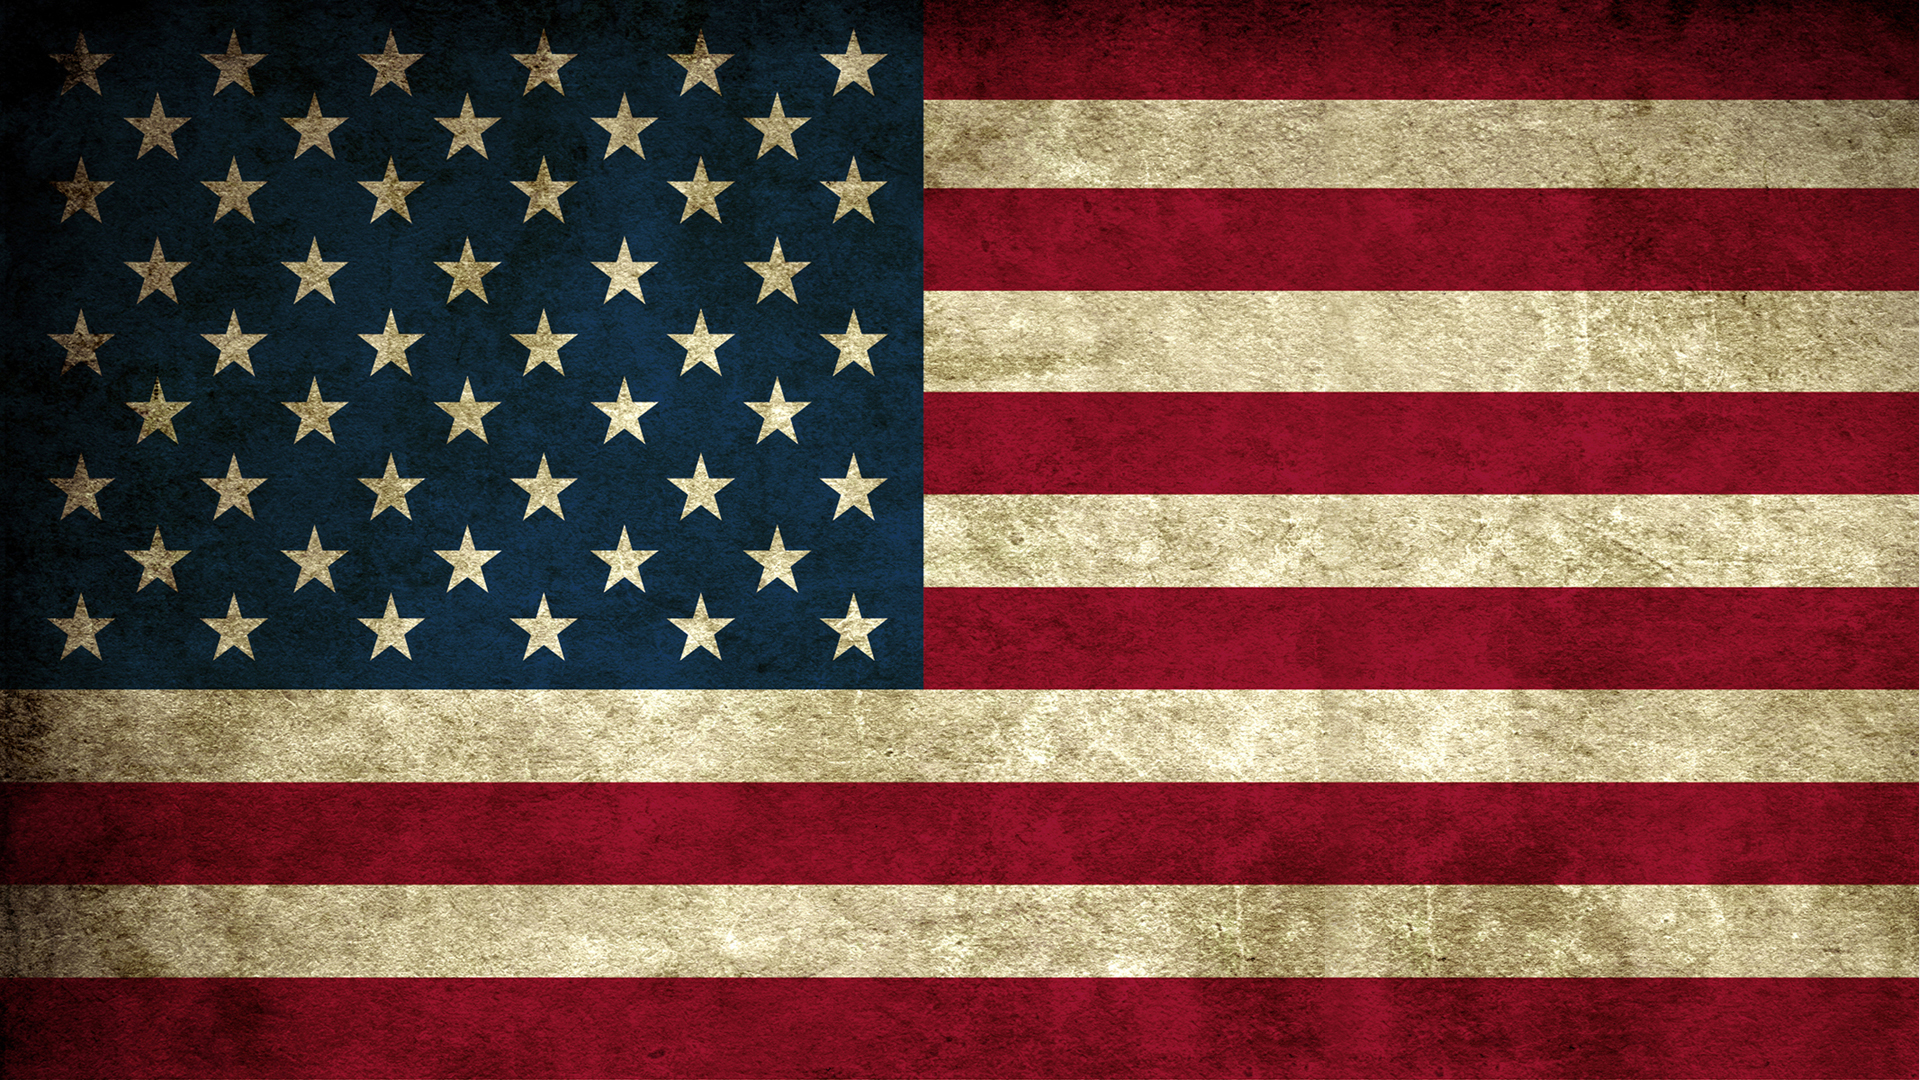 United States Of America Full HD Wallpapers download 1080p desktop 1920x1080